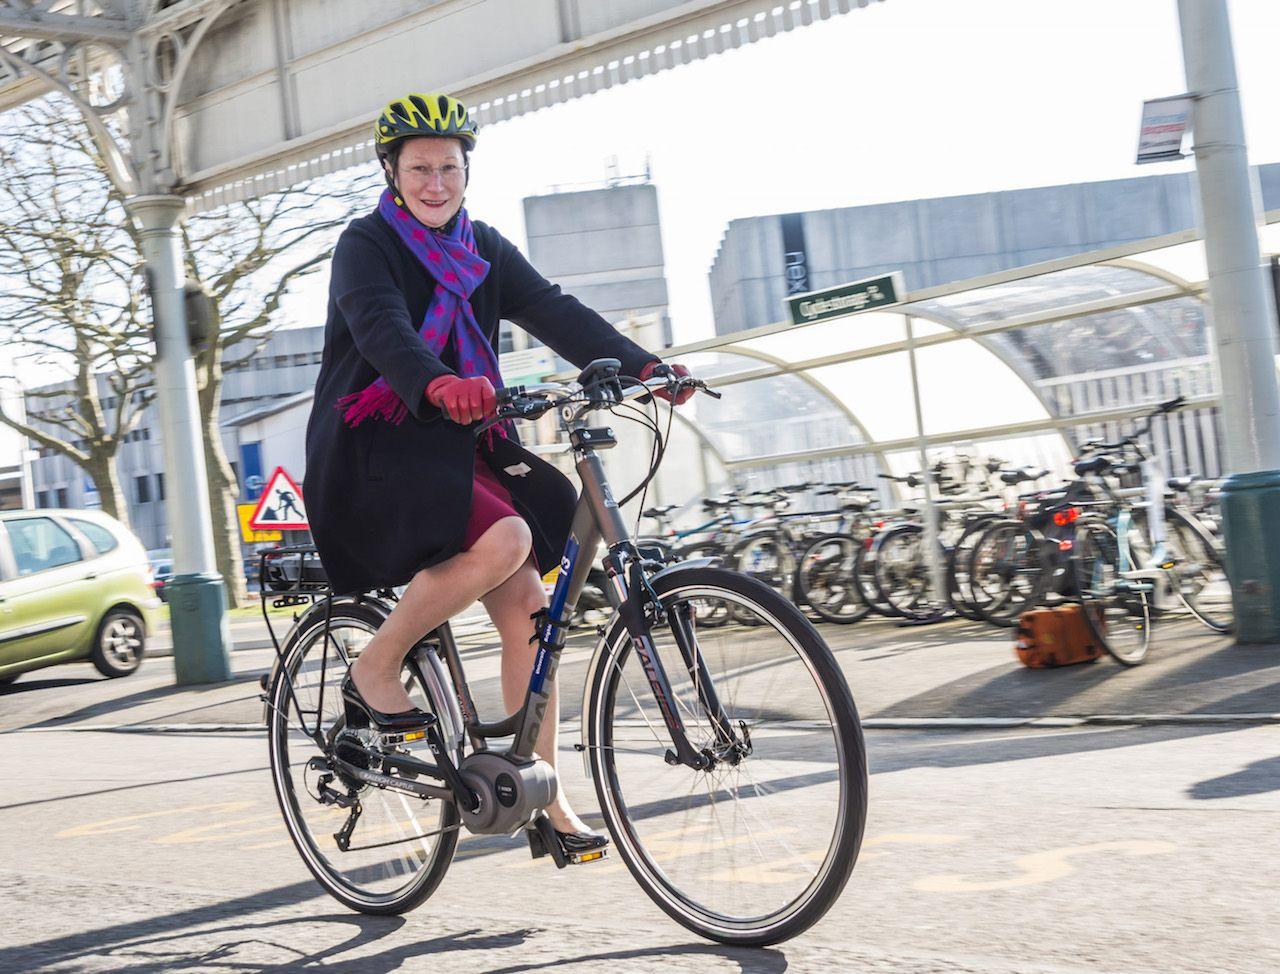 Uk Electric Bike Hire Schemes Begin Roll Out Video Power Bike